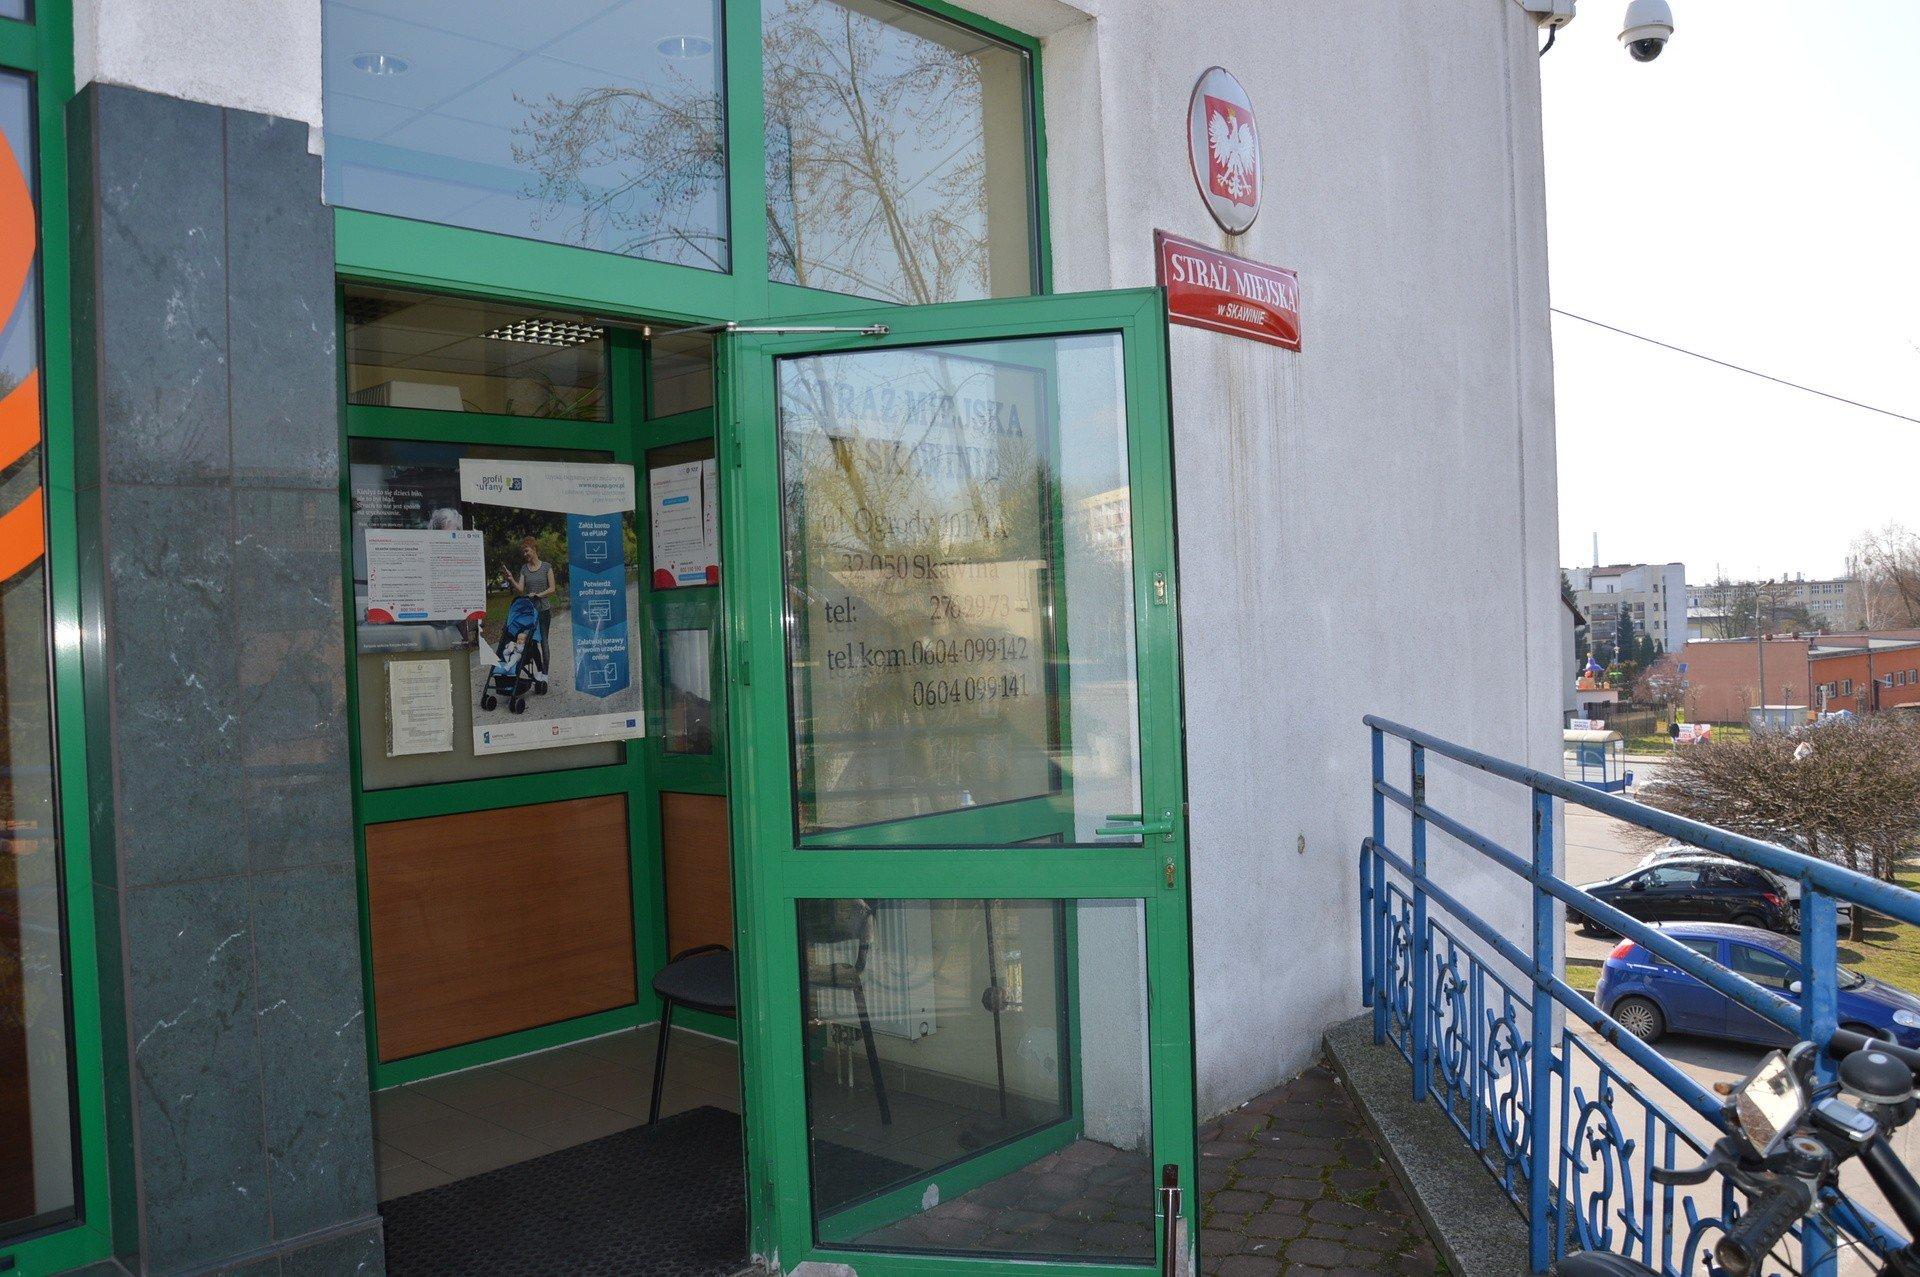 Find Internet & Mail-Order Retail Companies in Skawina - Dun